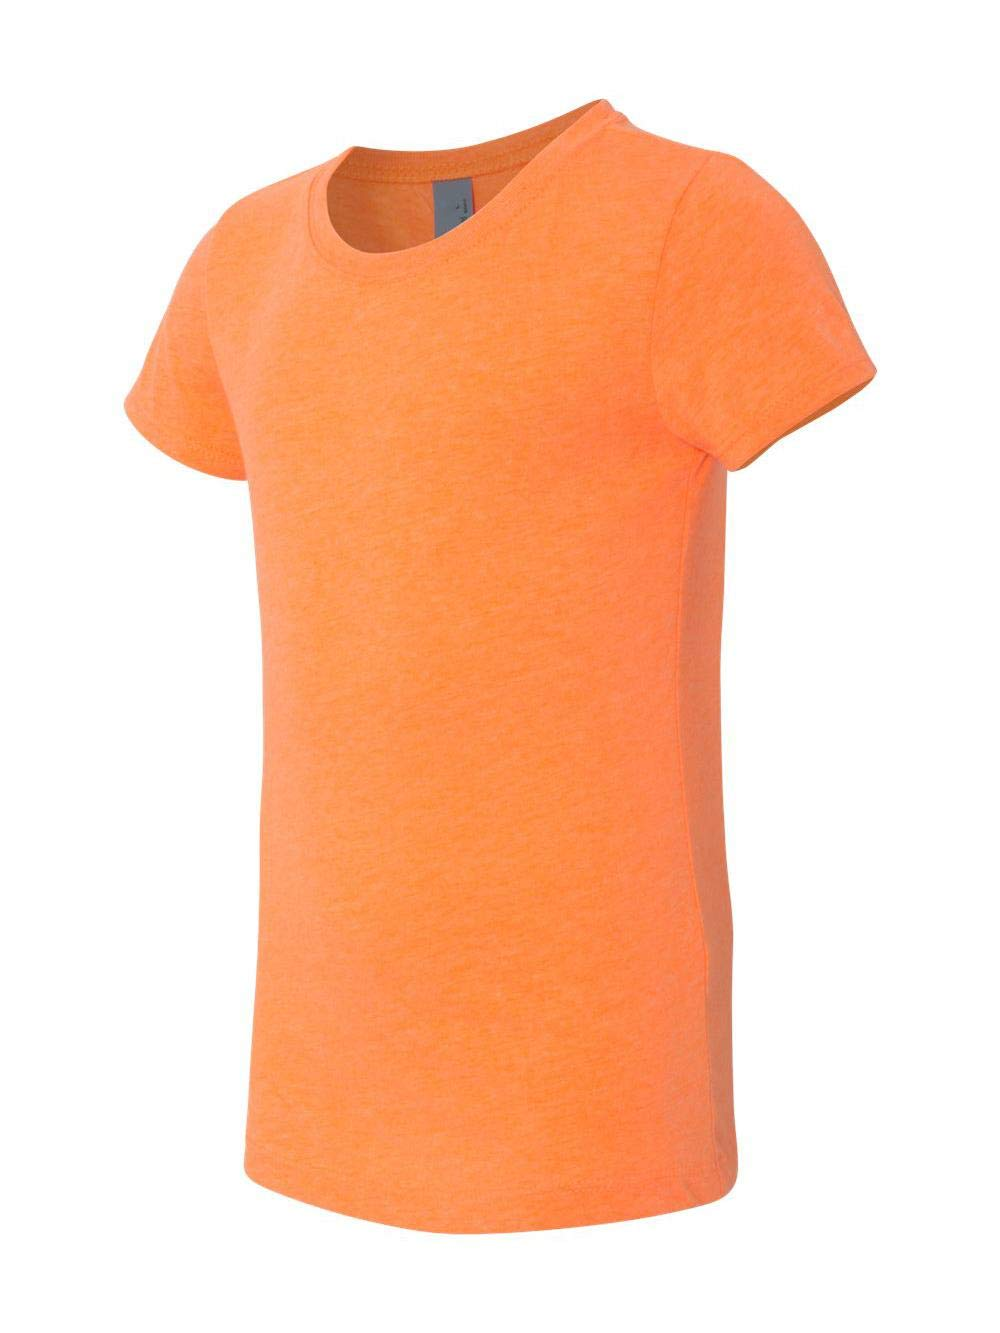 Next Level Girls' Princess Cvc Tee (Neon Heather Orange) (L)